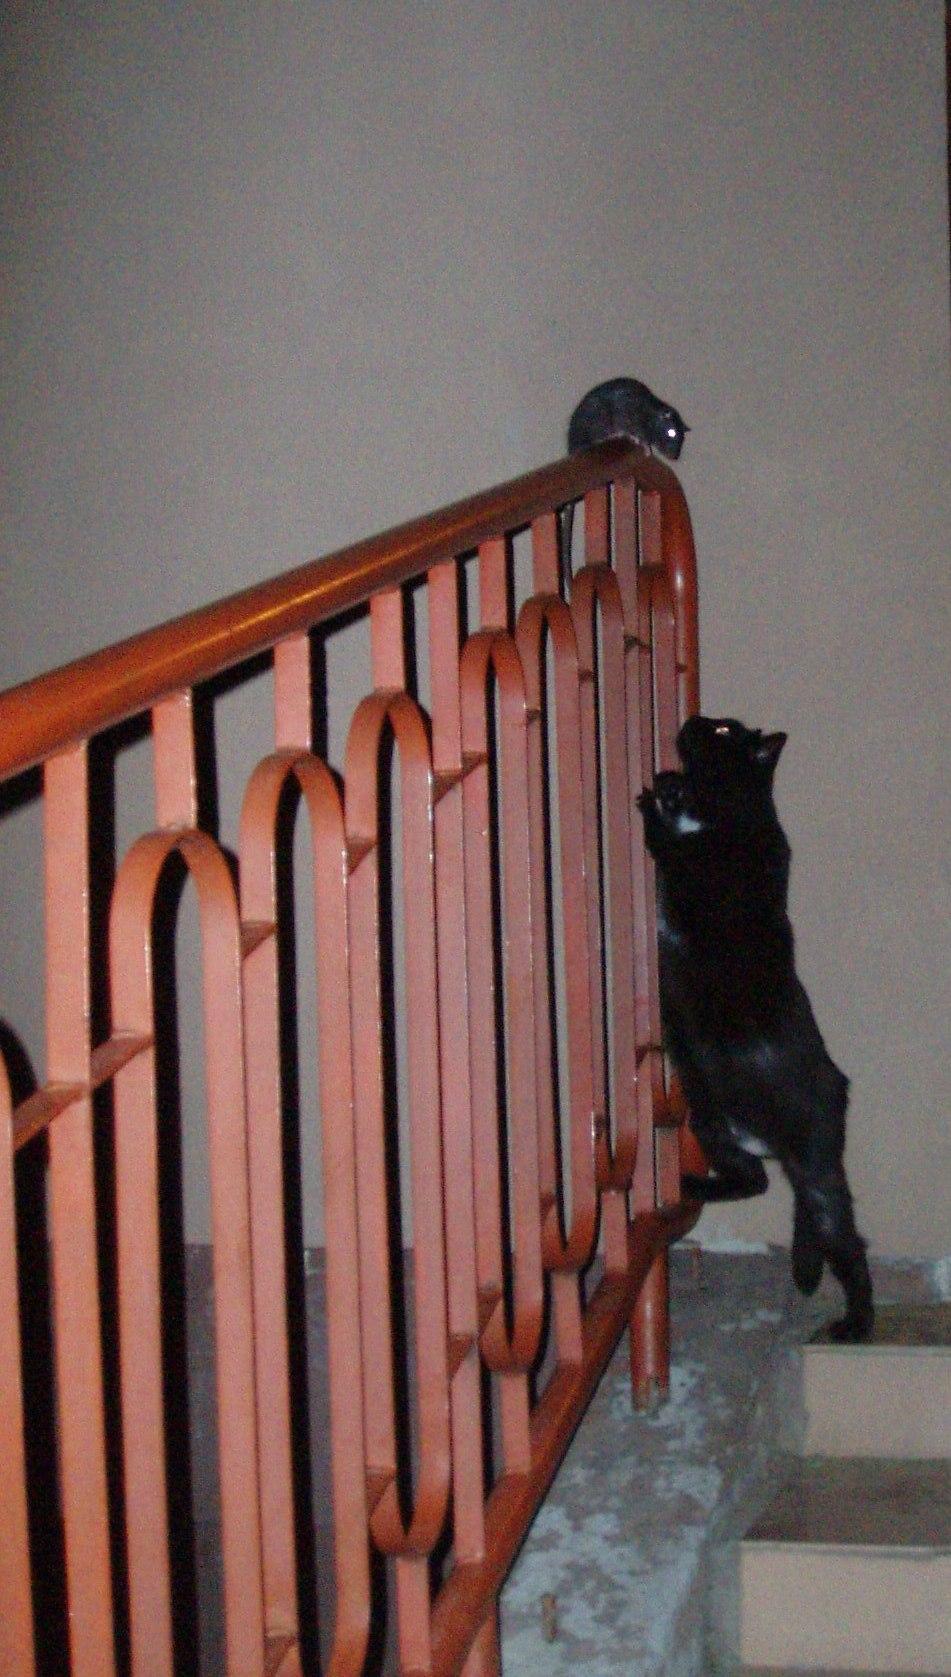 Наш охотник. Кошки-мышки